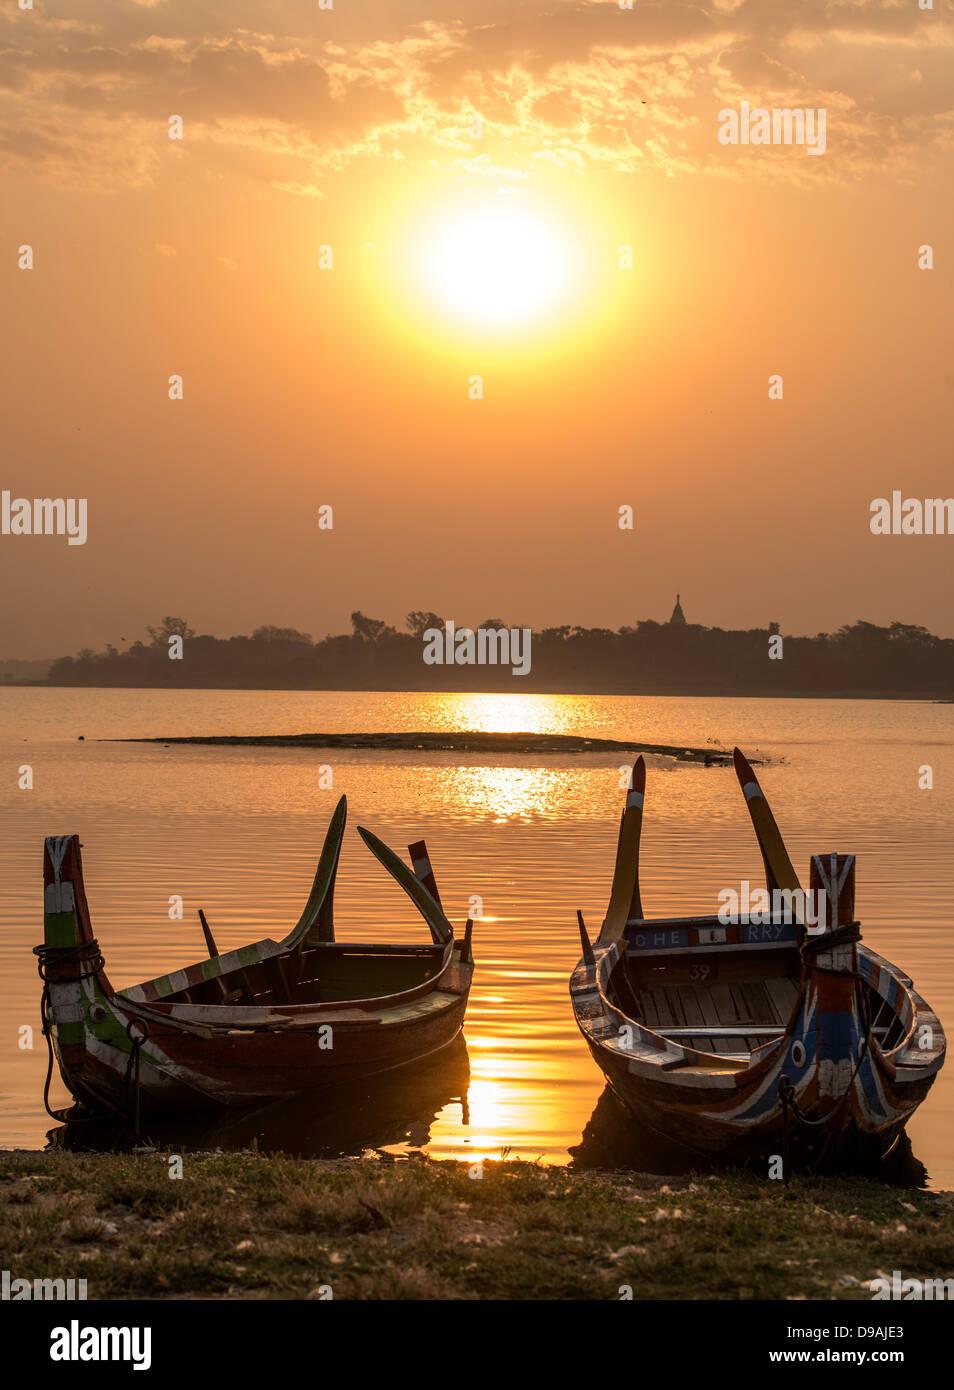 Sunrise over fisherman's boat by Ubein bridge Mandalay Burma Myanmar Stock Photo